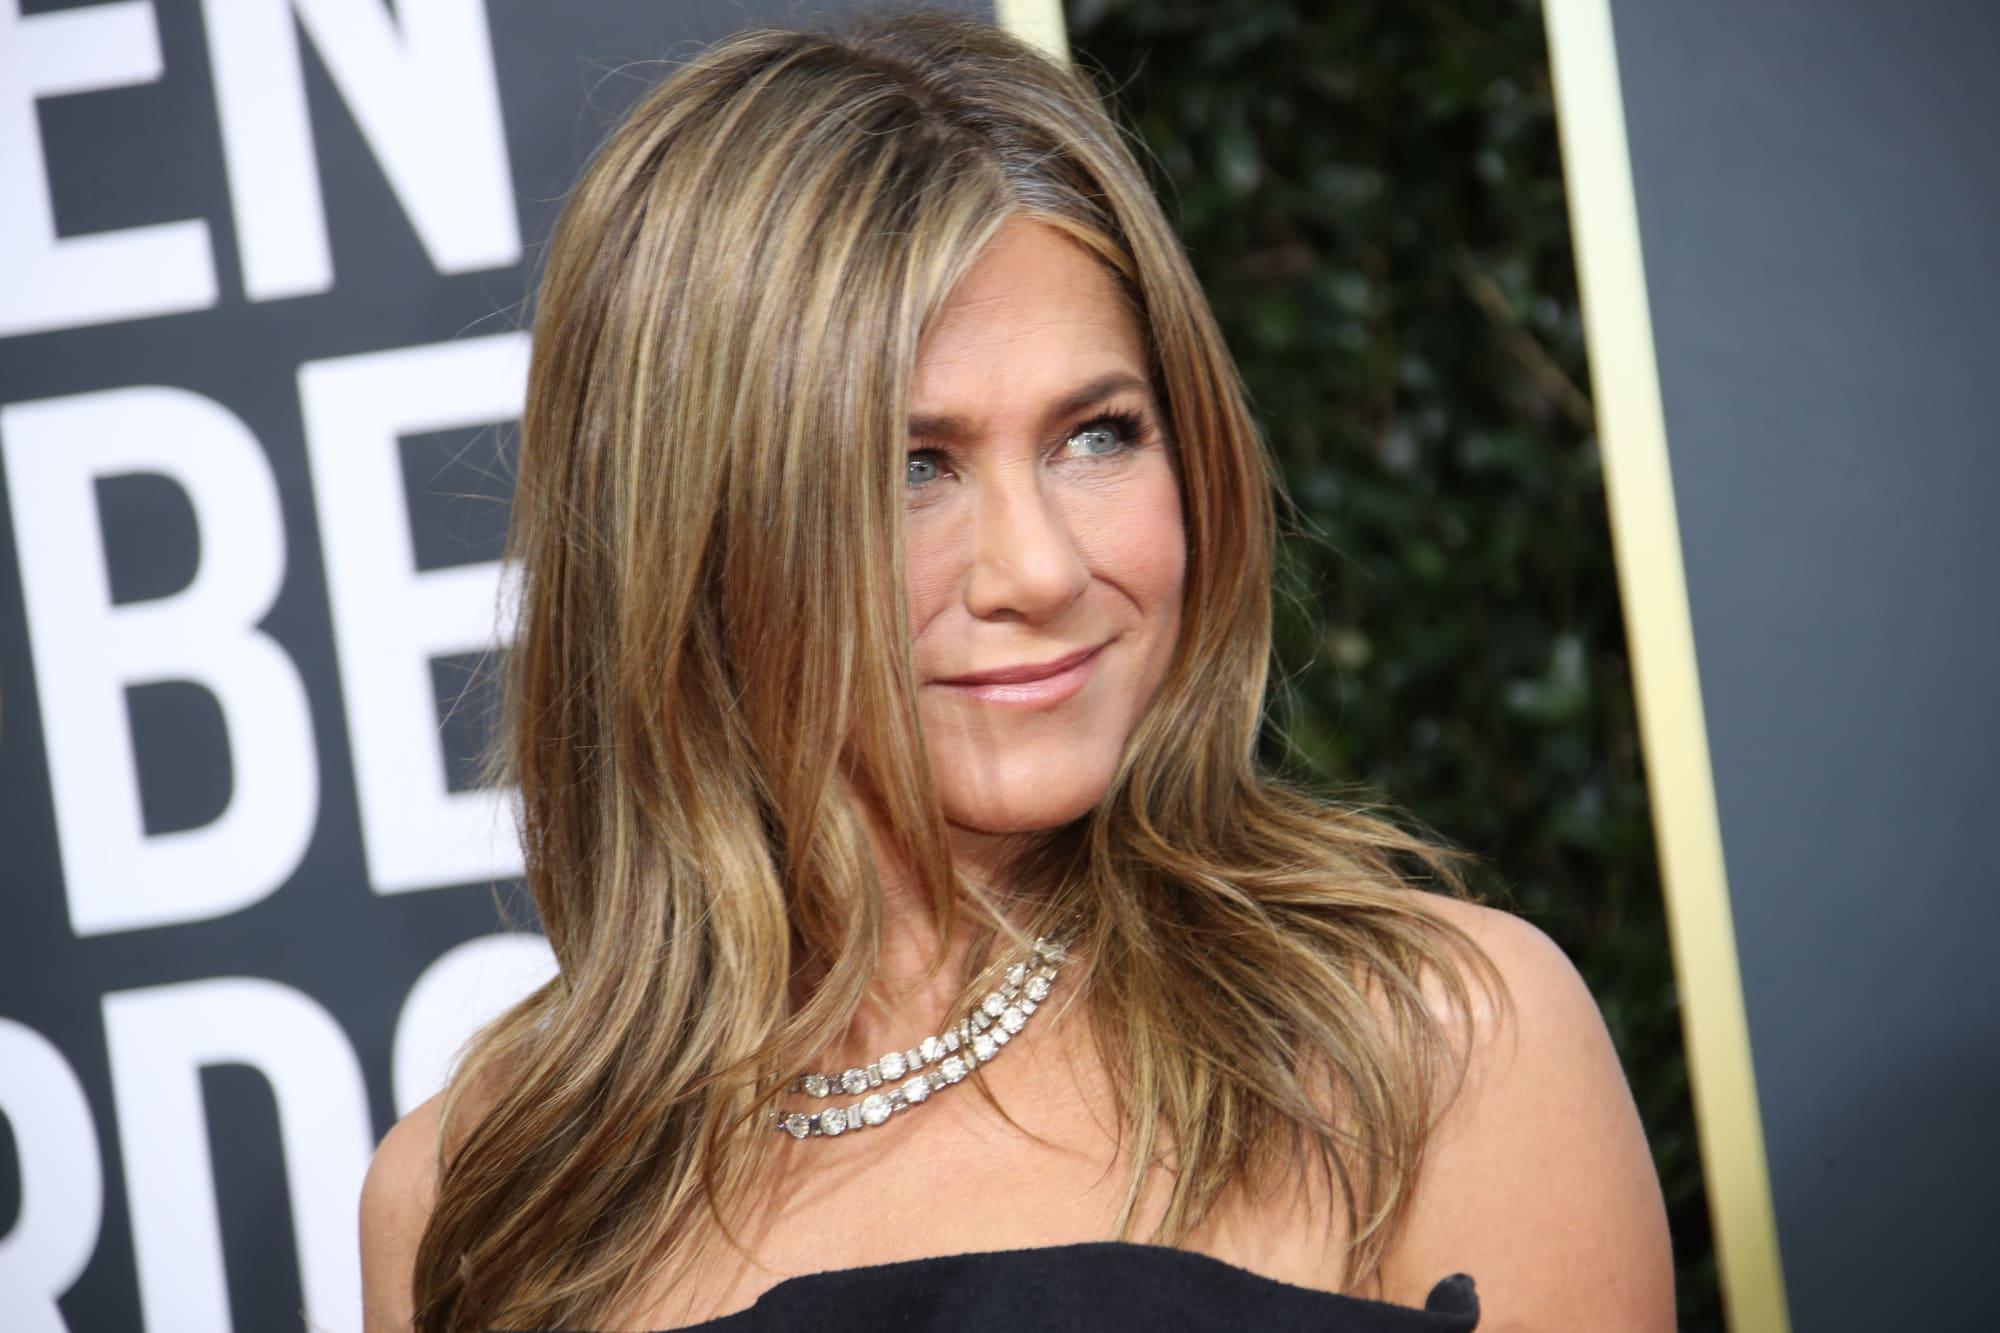 Jennifer Aniston Wishes Ex Justin Theroux Happy Birthday, Amid David Schwimmer Romance Rumors